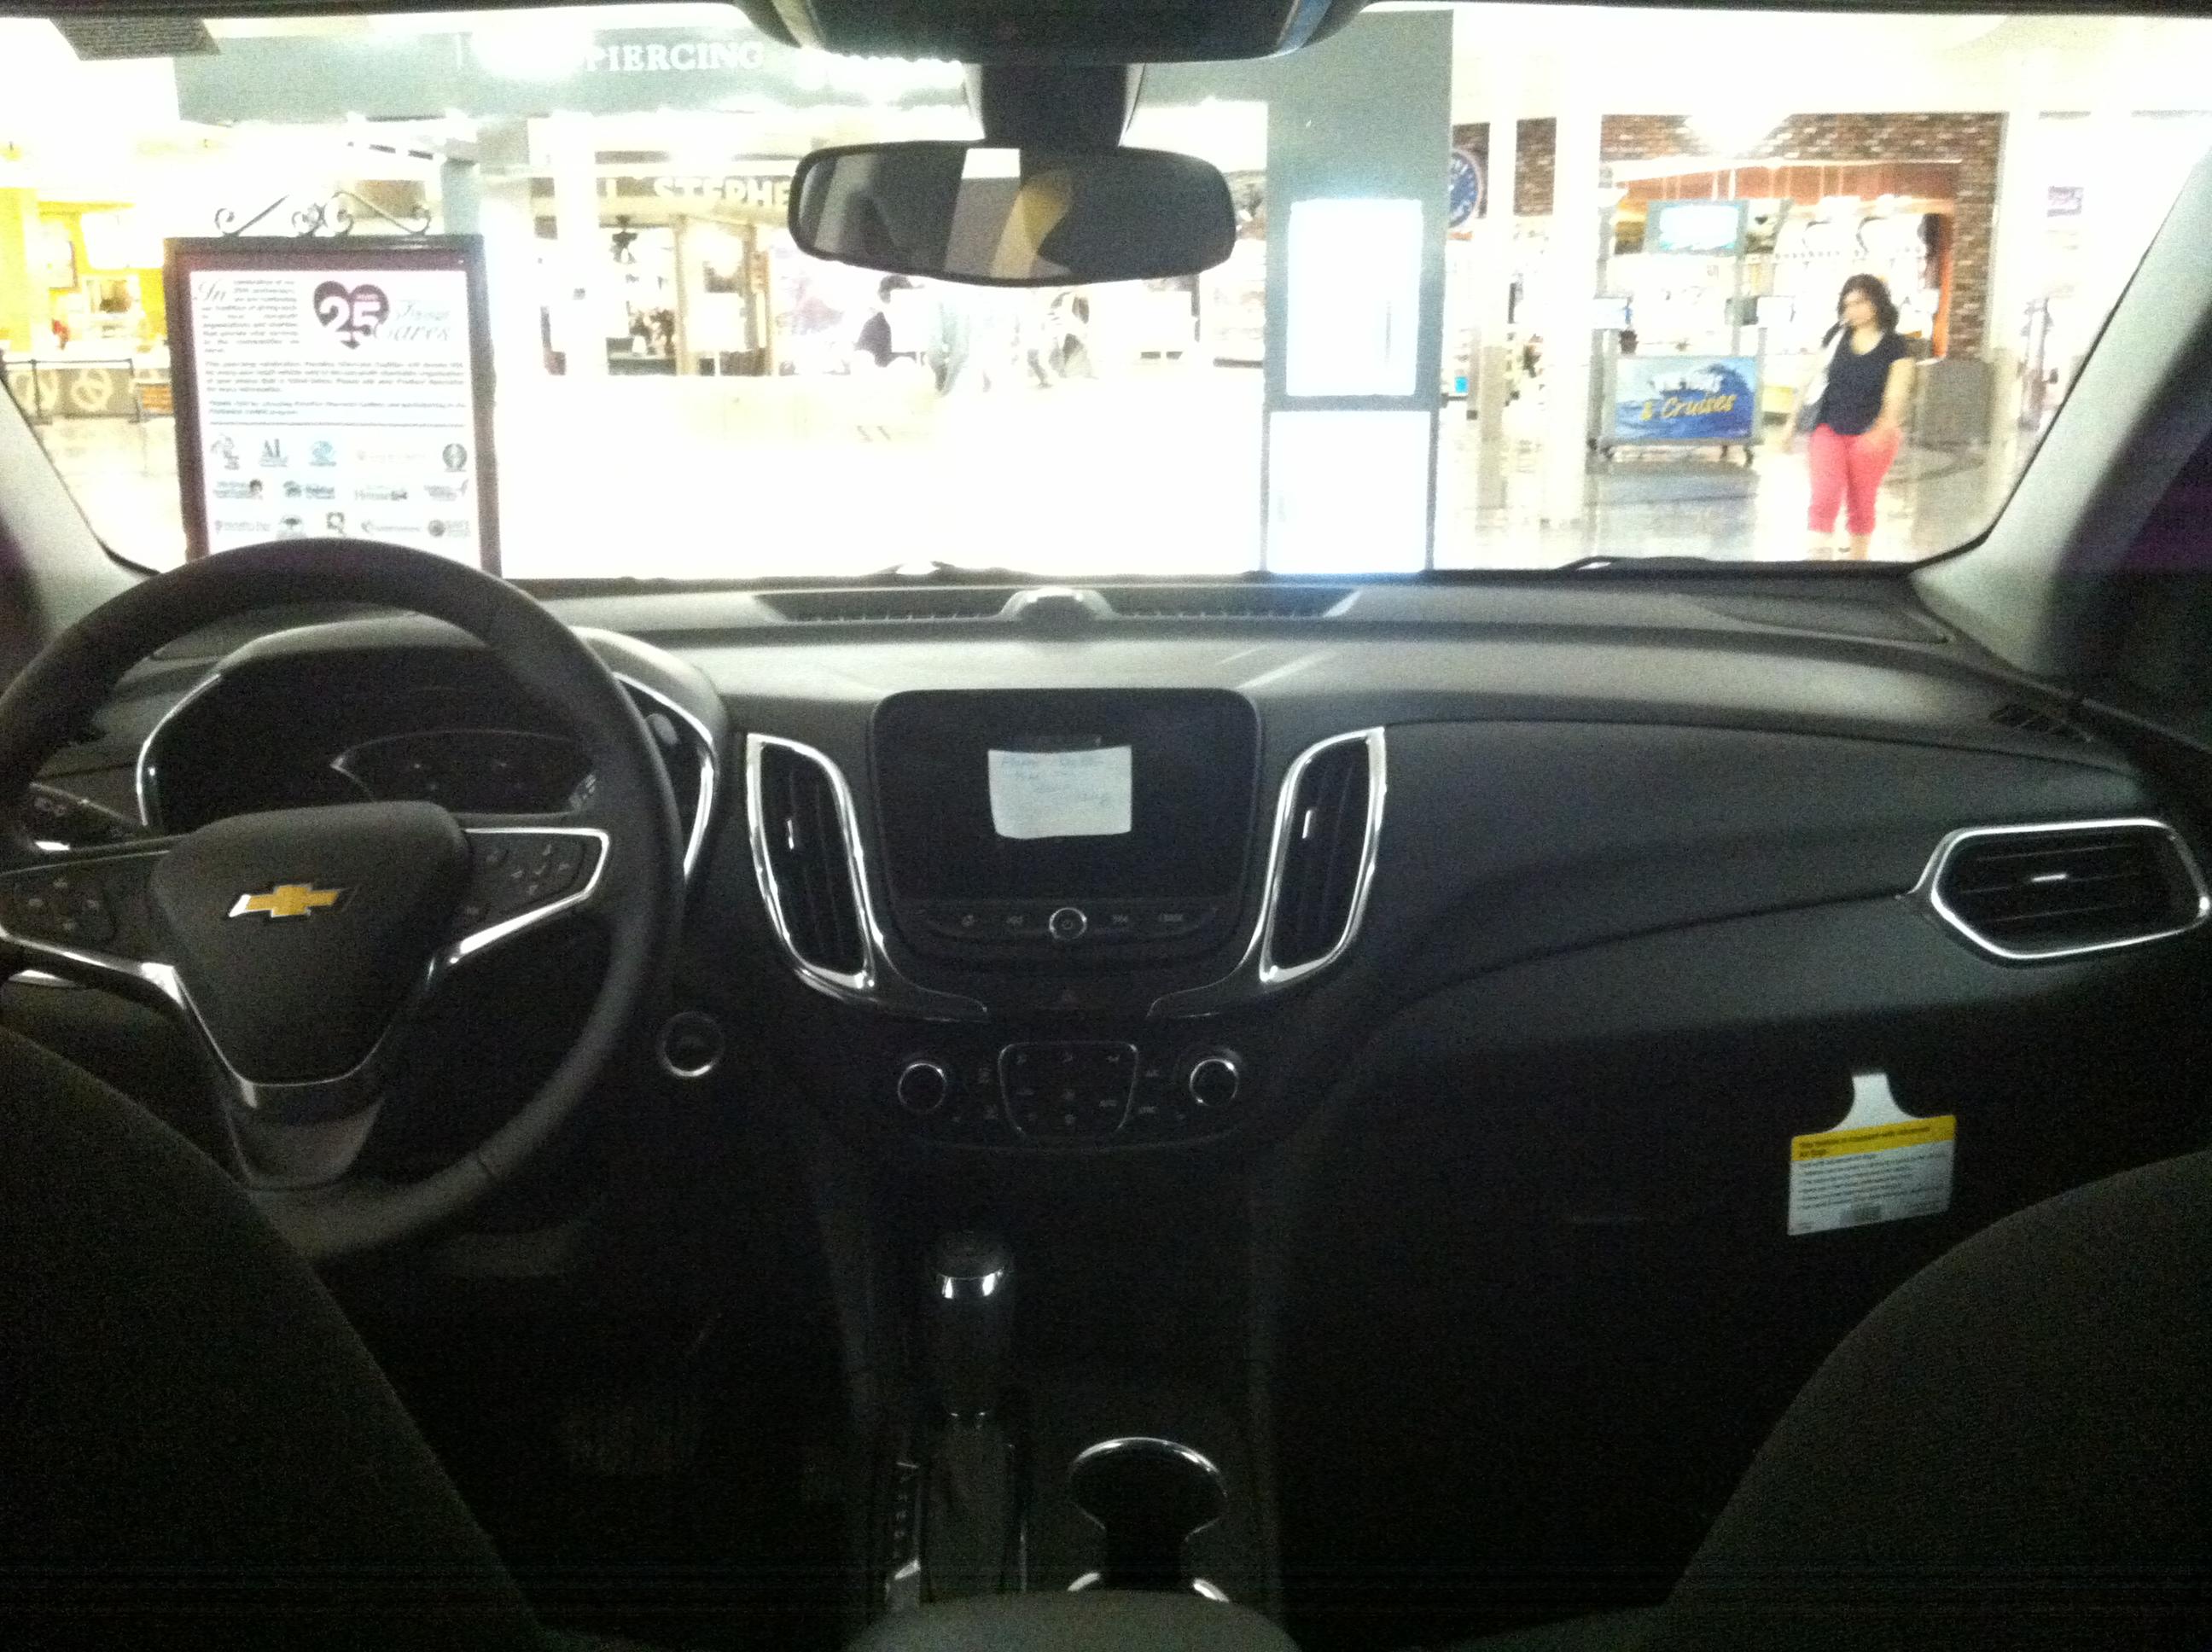 File Chevrolet Equinox 2017 Cuv Interior Jpg Wikimedia Commons